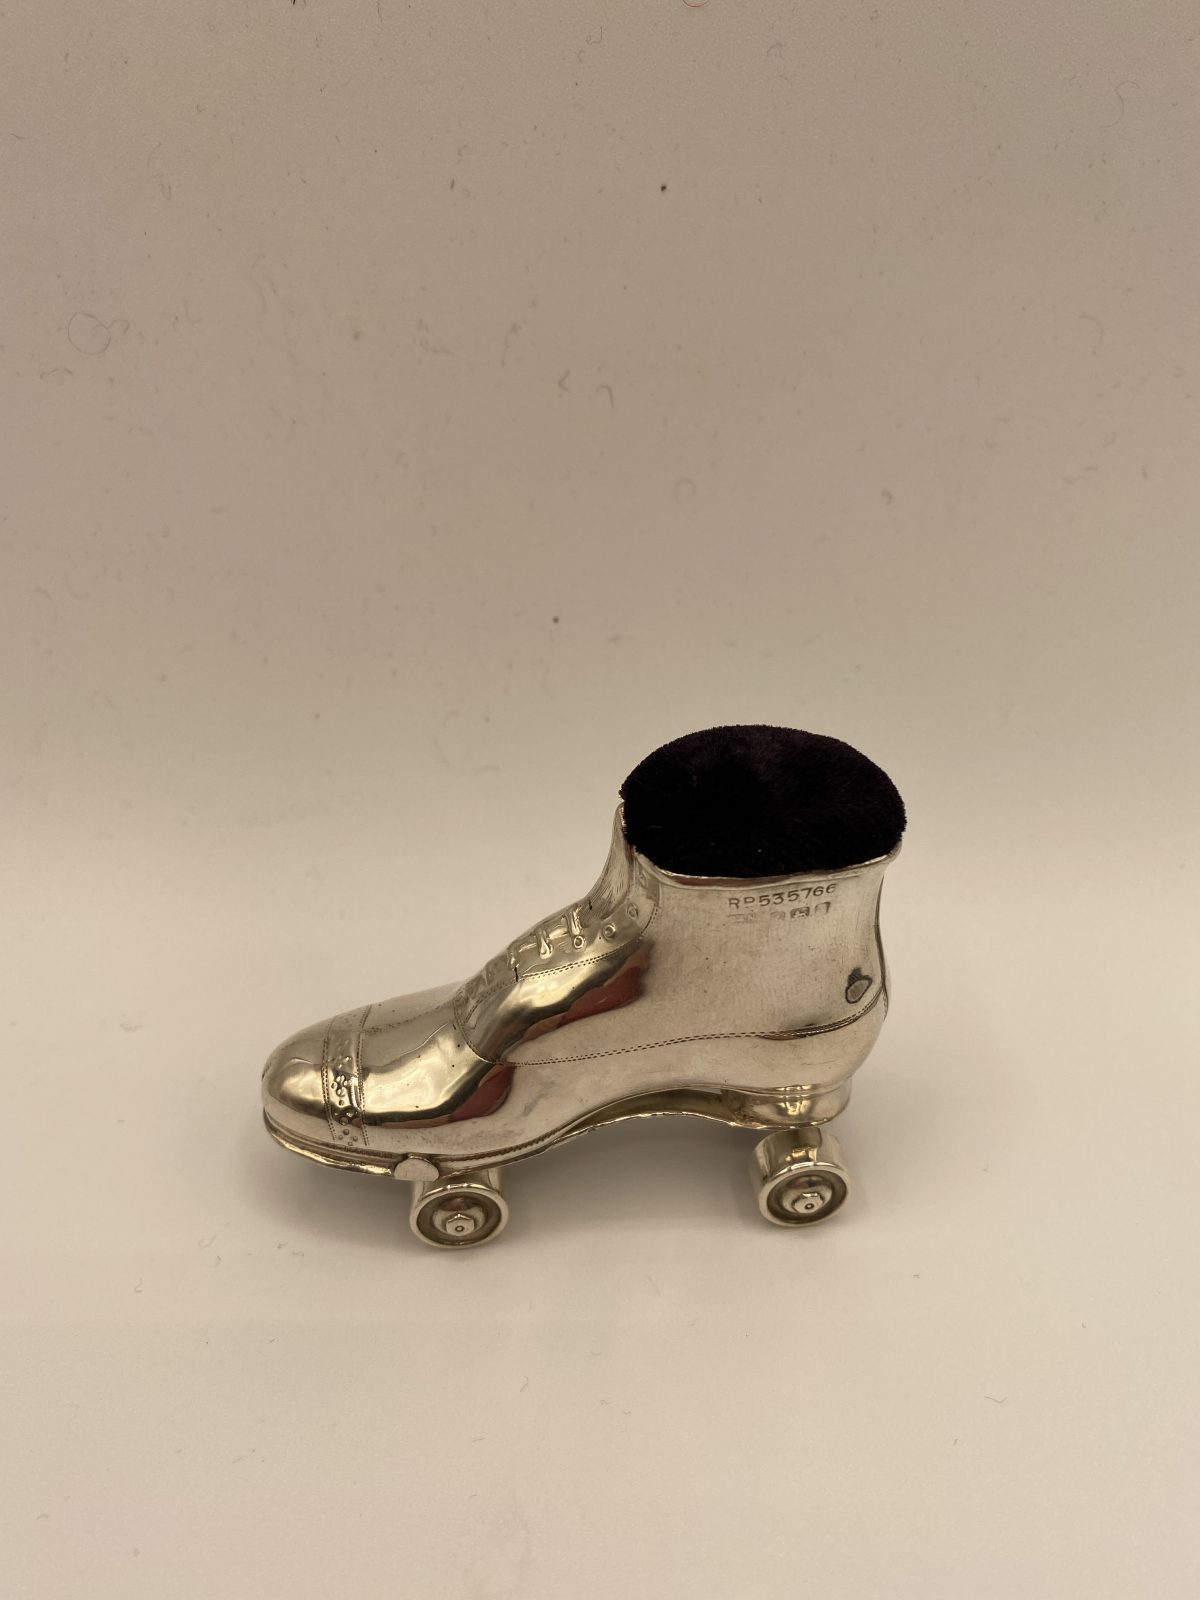 CAB 14 - A Rare Silver Roller Skate Pin Cushion, Hallmarked 1908.  £395